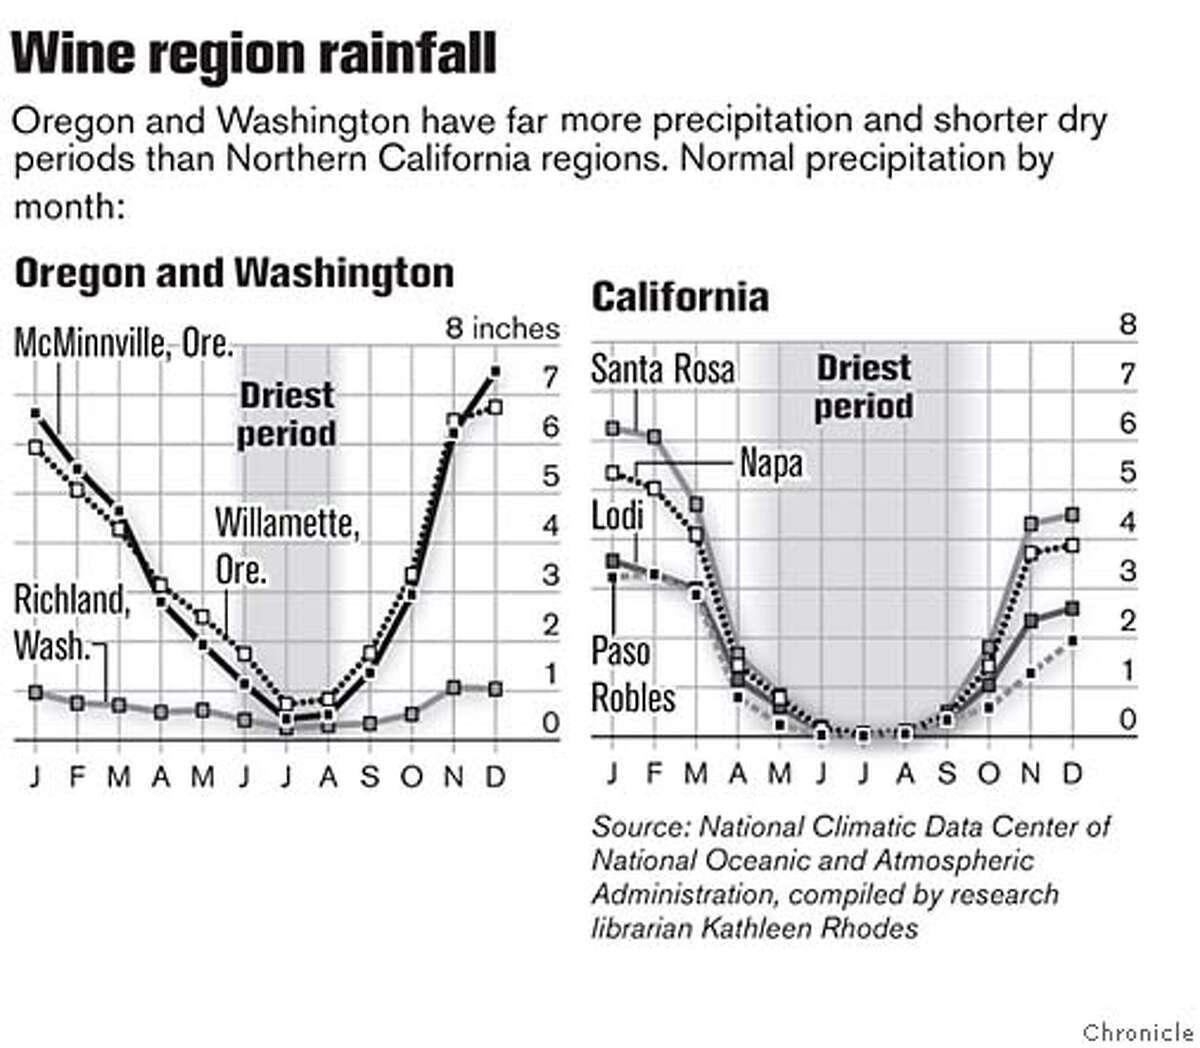 Wine Region Rainfall. Chronicle Graphic